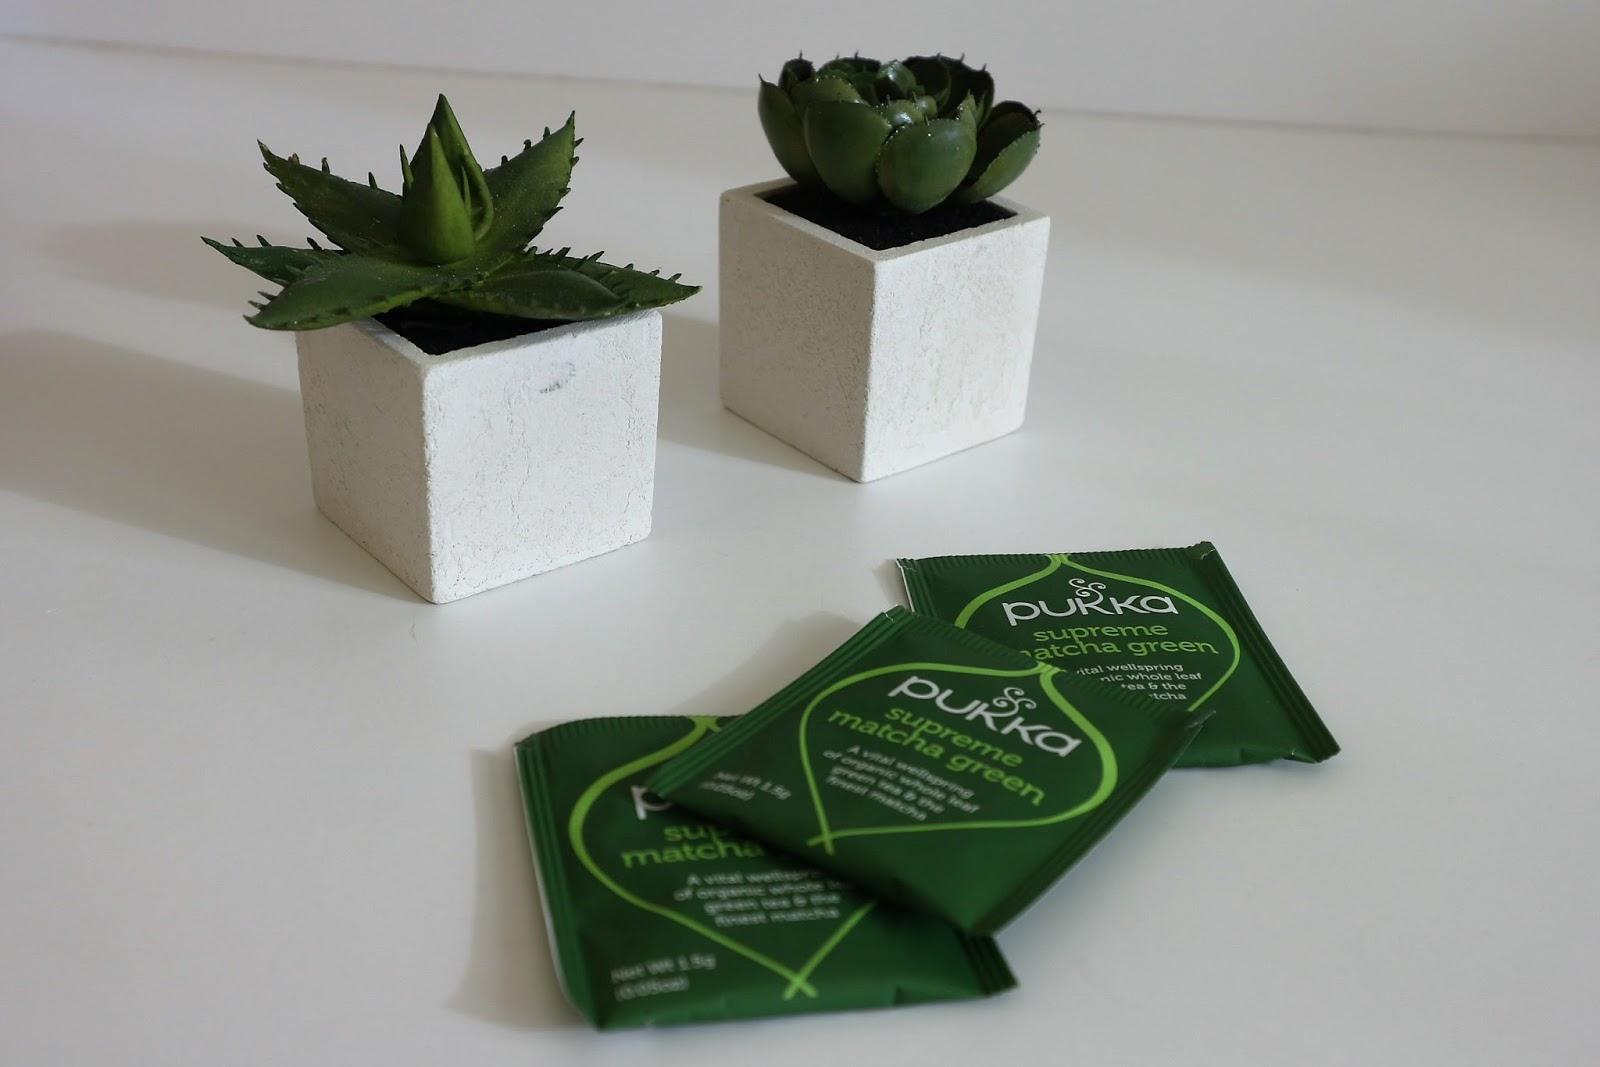 Pukka Matcha tea bags